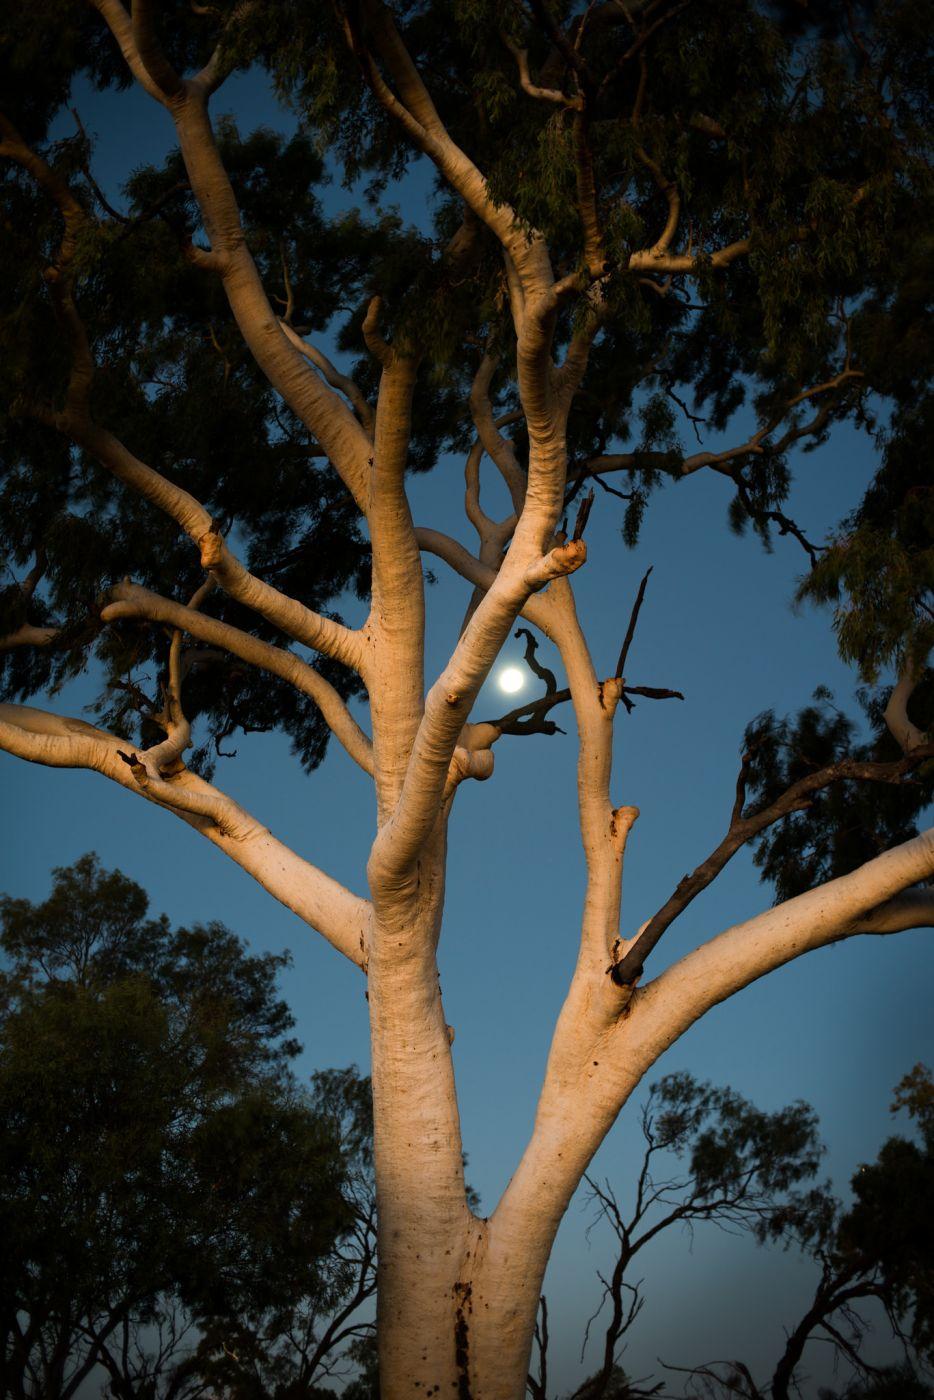 Set sun reflects off clouds to illuminate tree, Australia